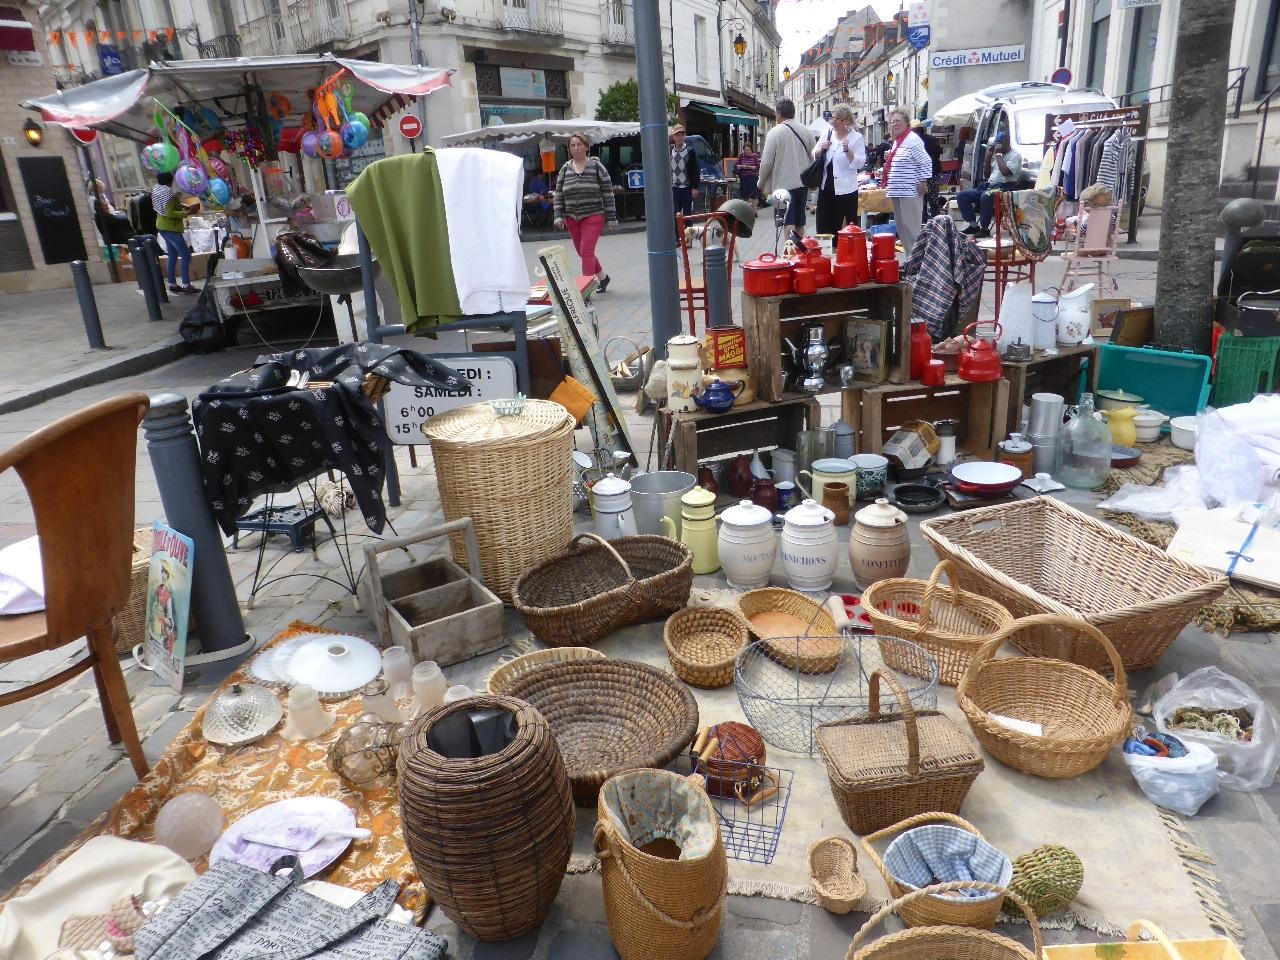 Experience loire loire valley france tourism - Vide grenier 84 aujourd hui ...